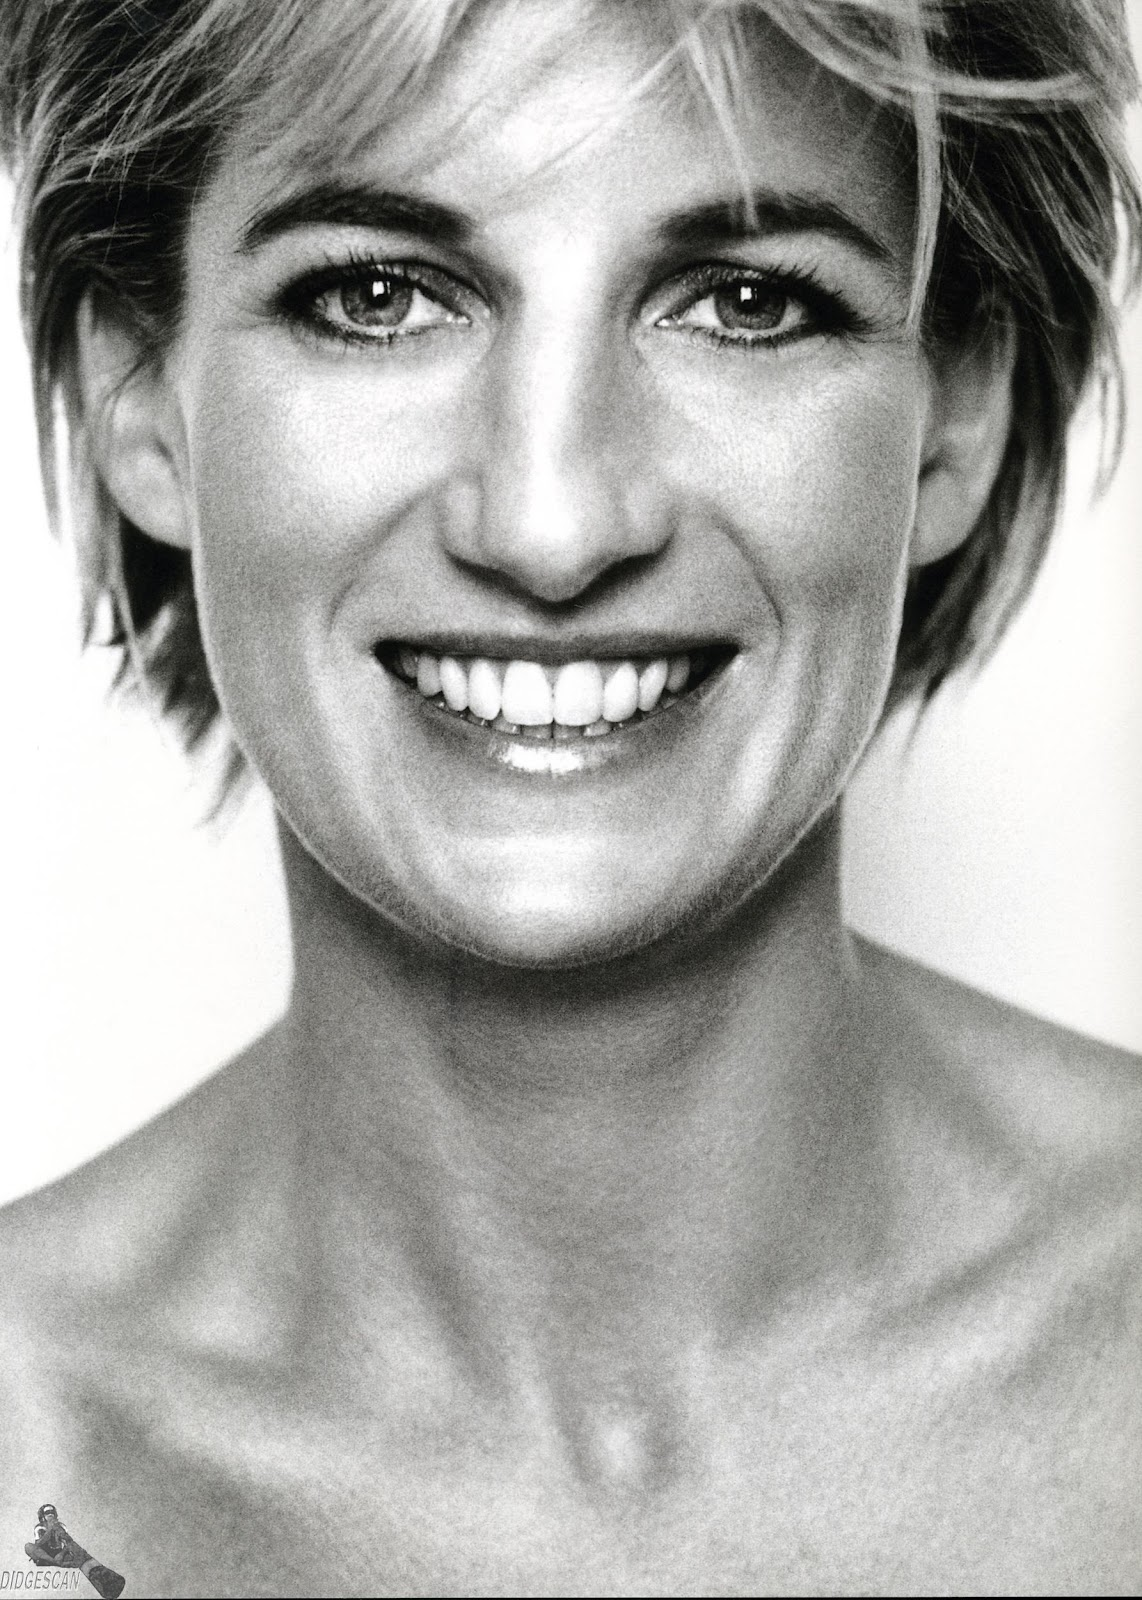 Princess Diana News Blog: L O O K I N G F O R M Y E V E: Happy Birthday, Princess Diana